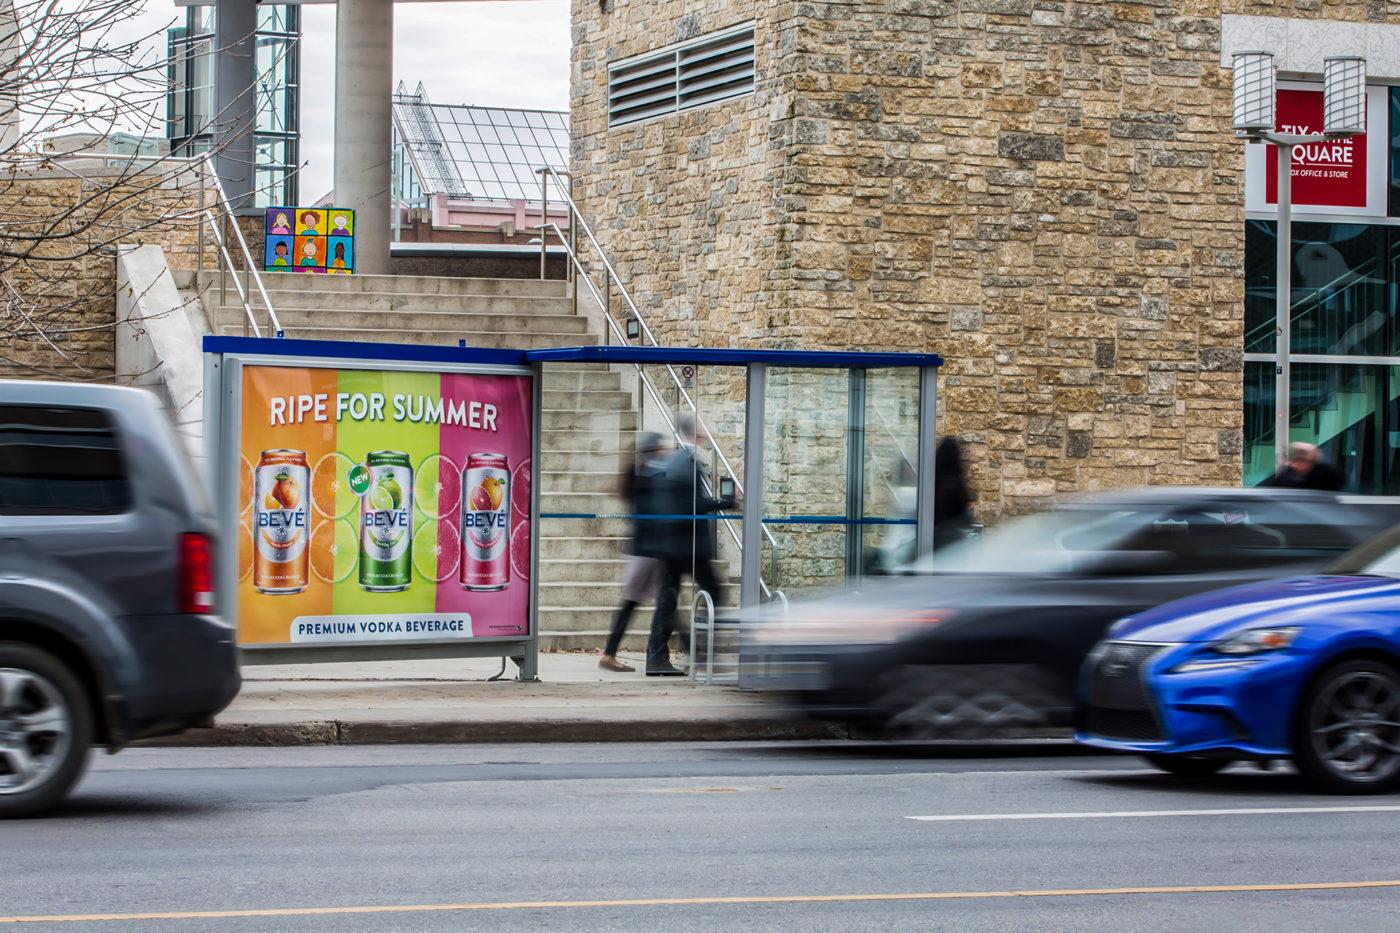 Beve - Ripe For Summer - Mobilier urbain– super abribus du centre-ville (Edmonton, Alberta)